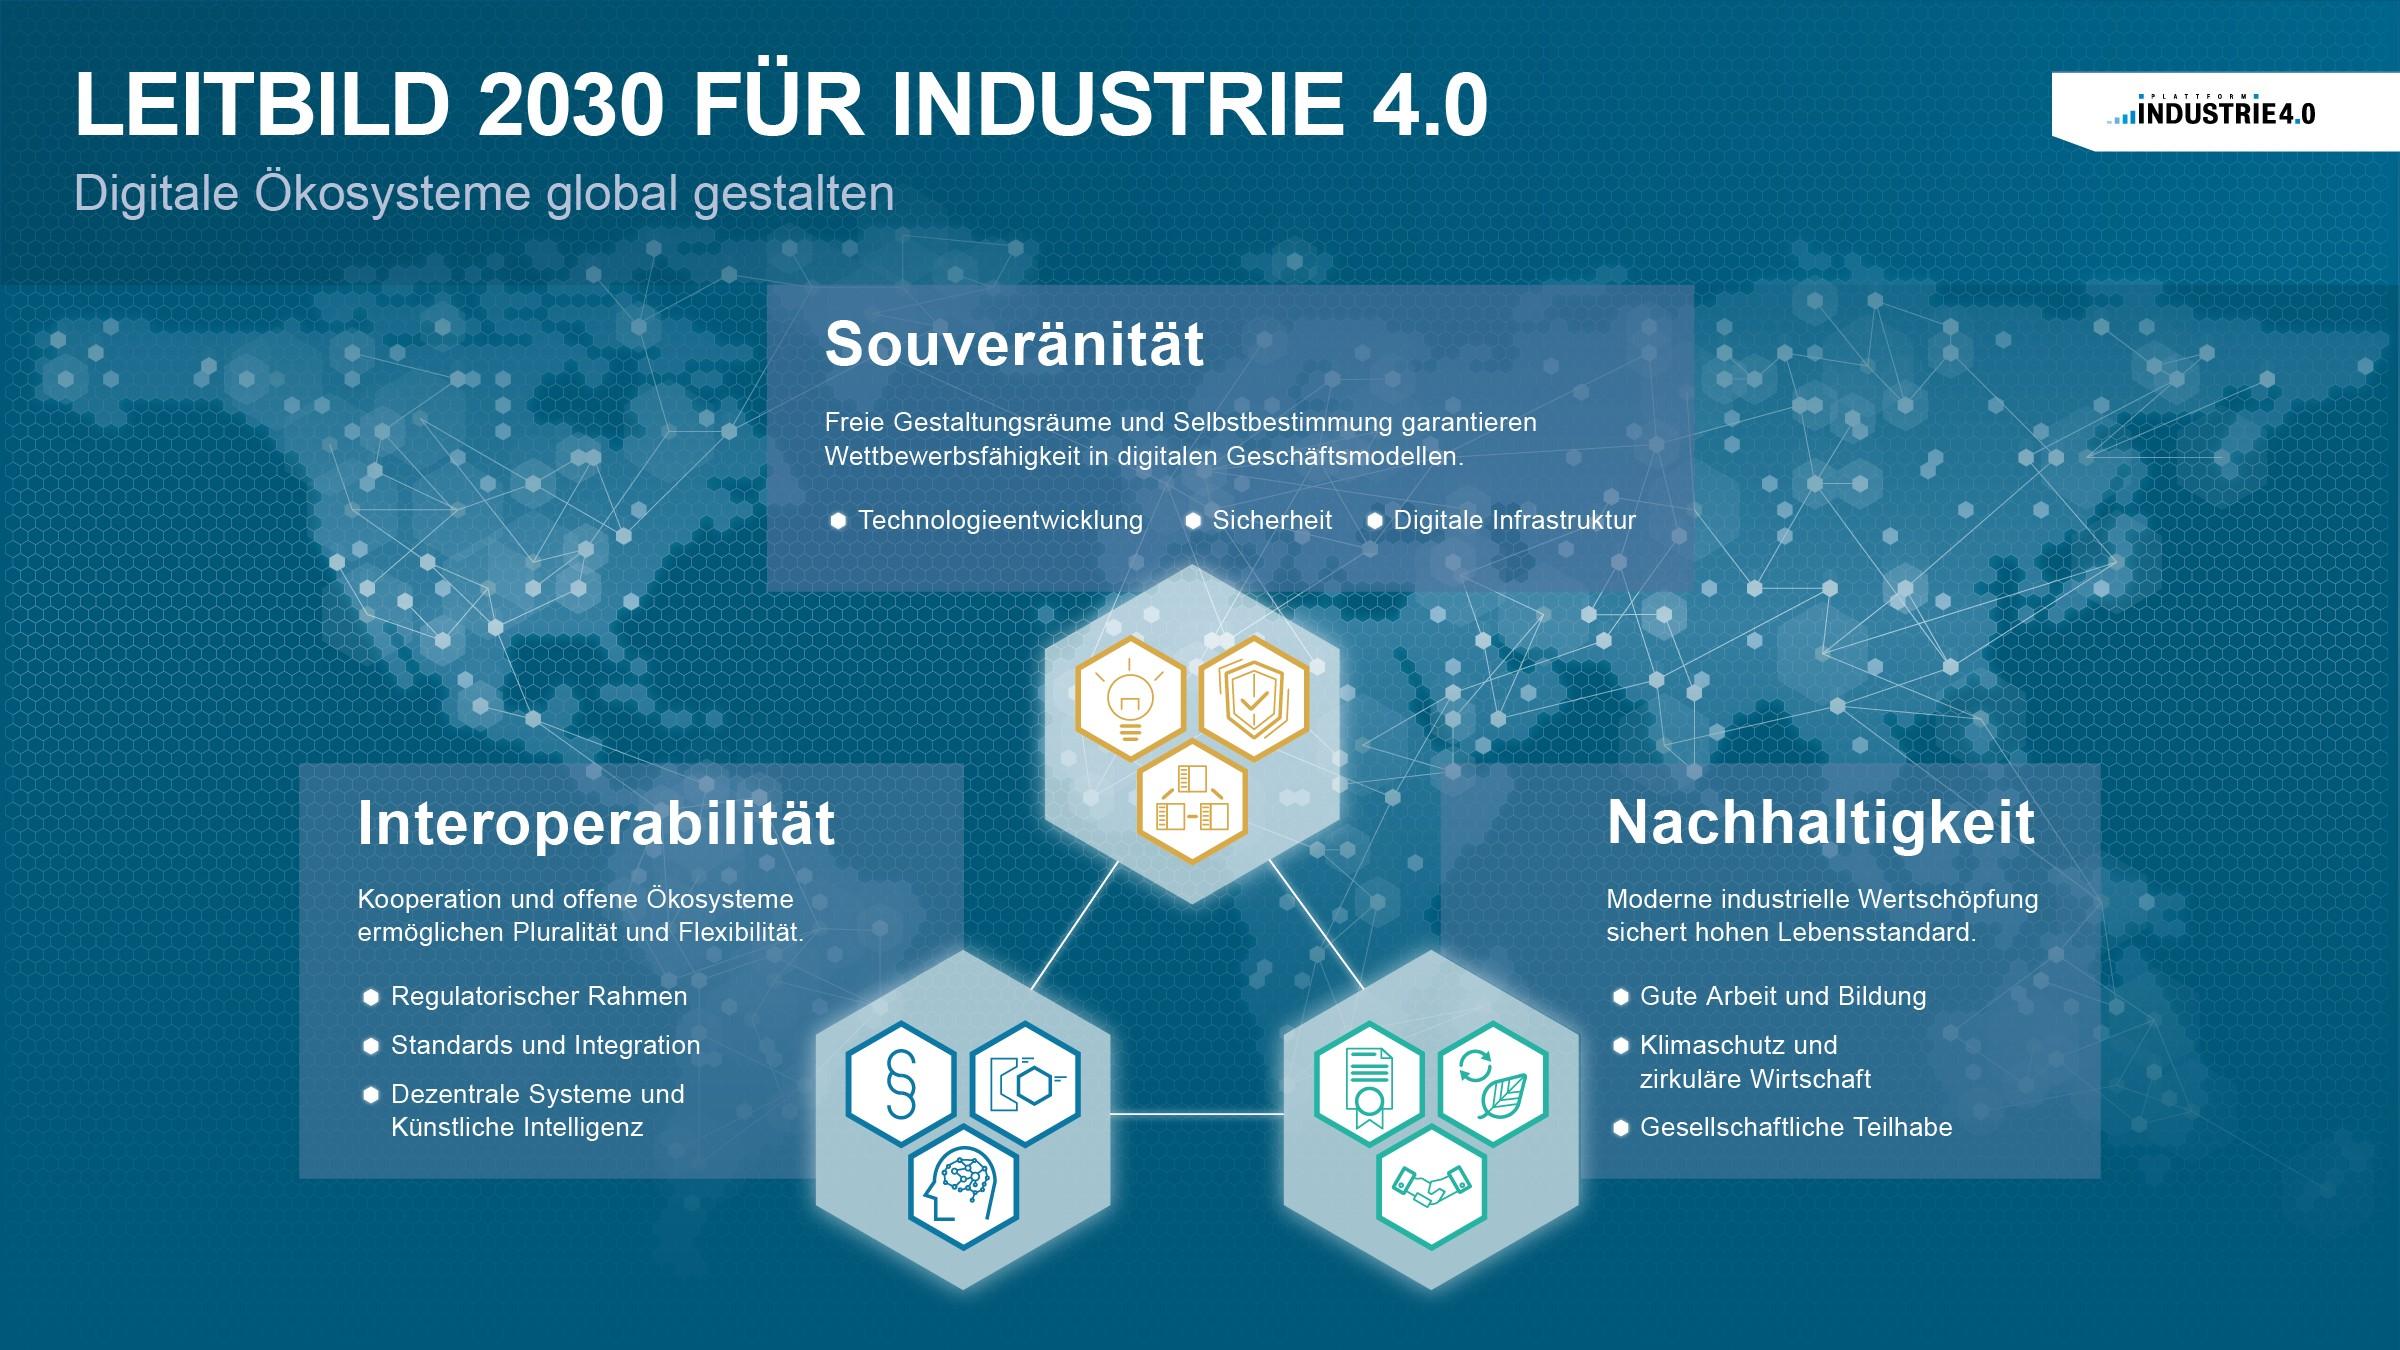 Leitbild 2030 für Industrie 4.0 - Digitale Ökosysteme global gestalten: Grafik: Plattform Industrie 4.0